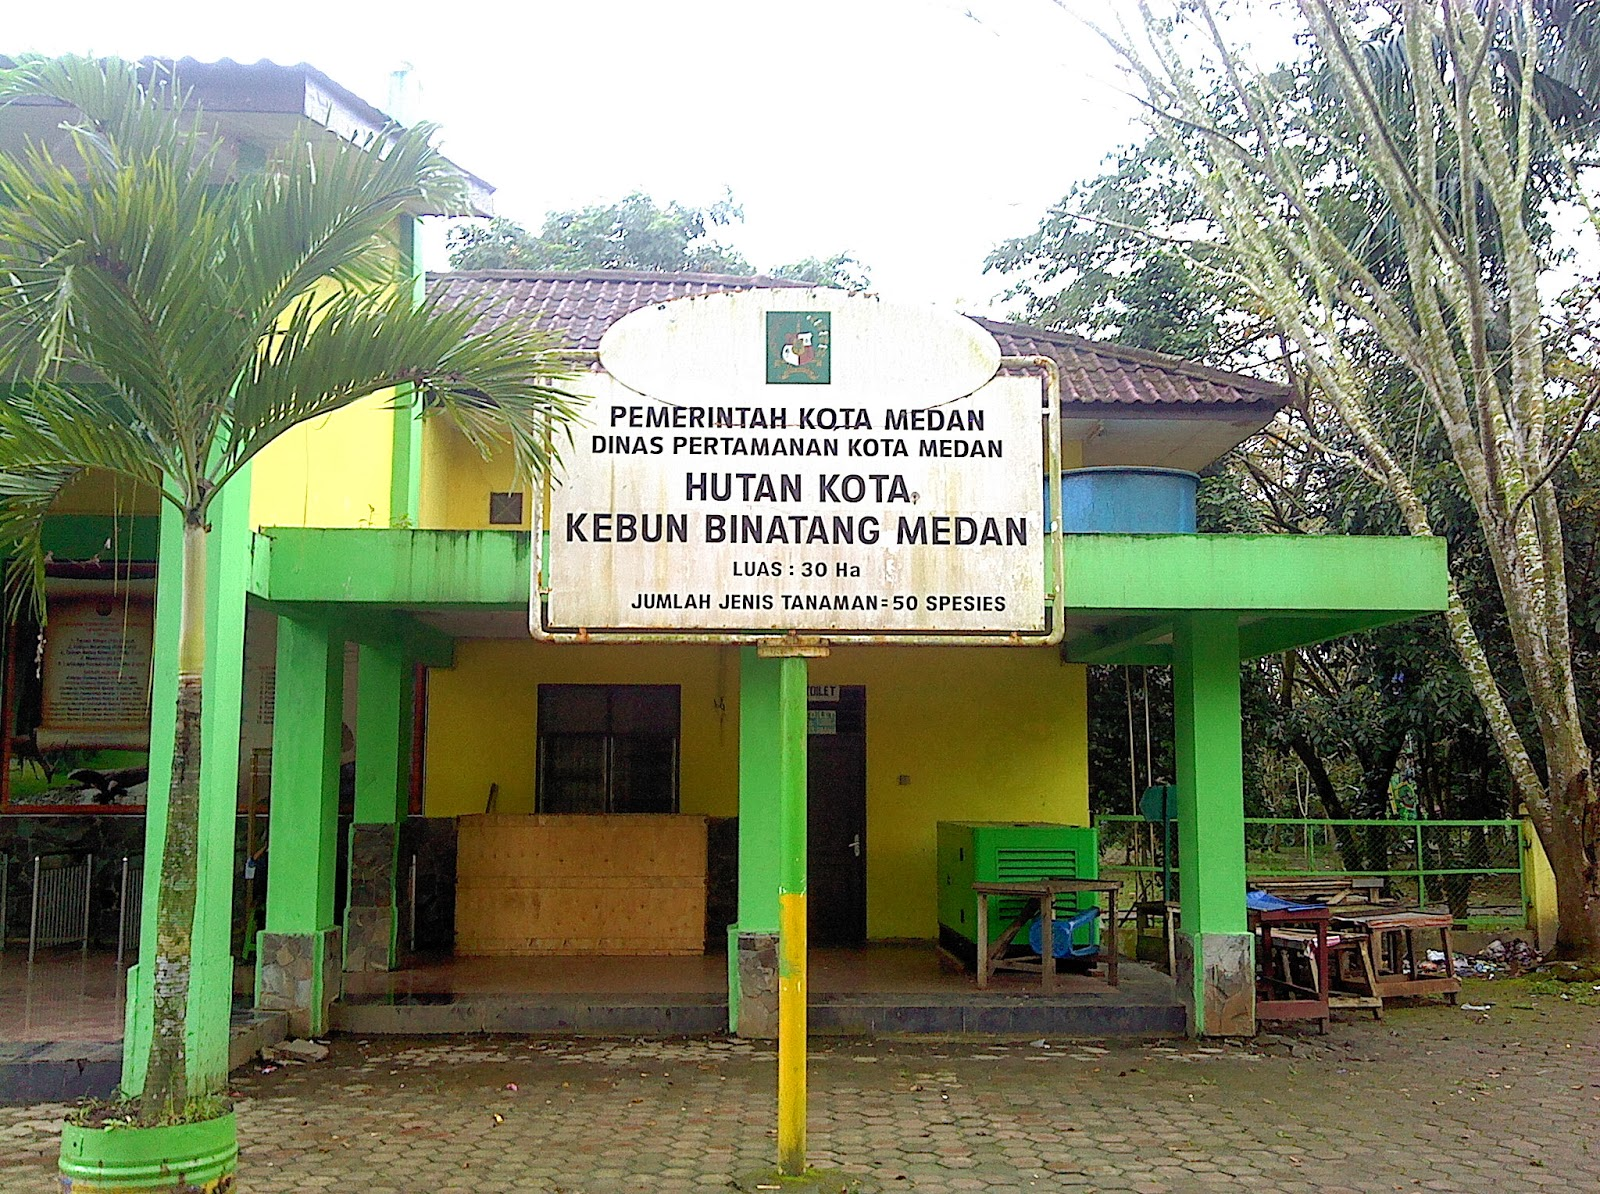 Wisata Kebun Binatang Sumatera Utara Medan Kota